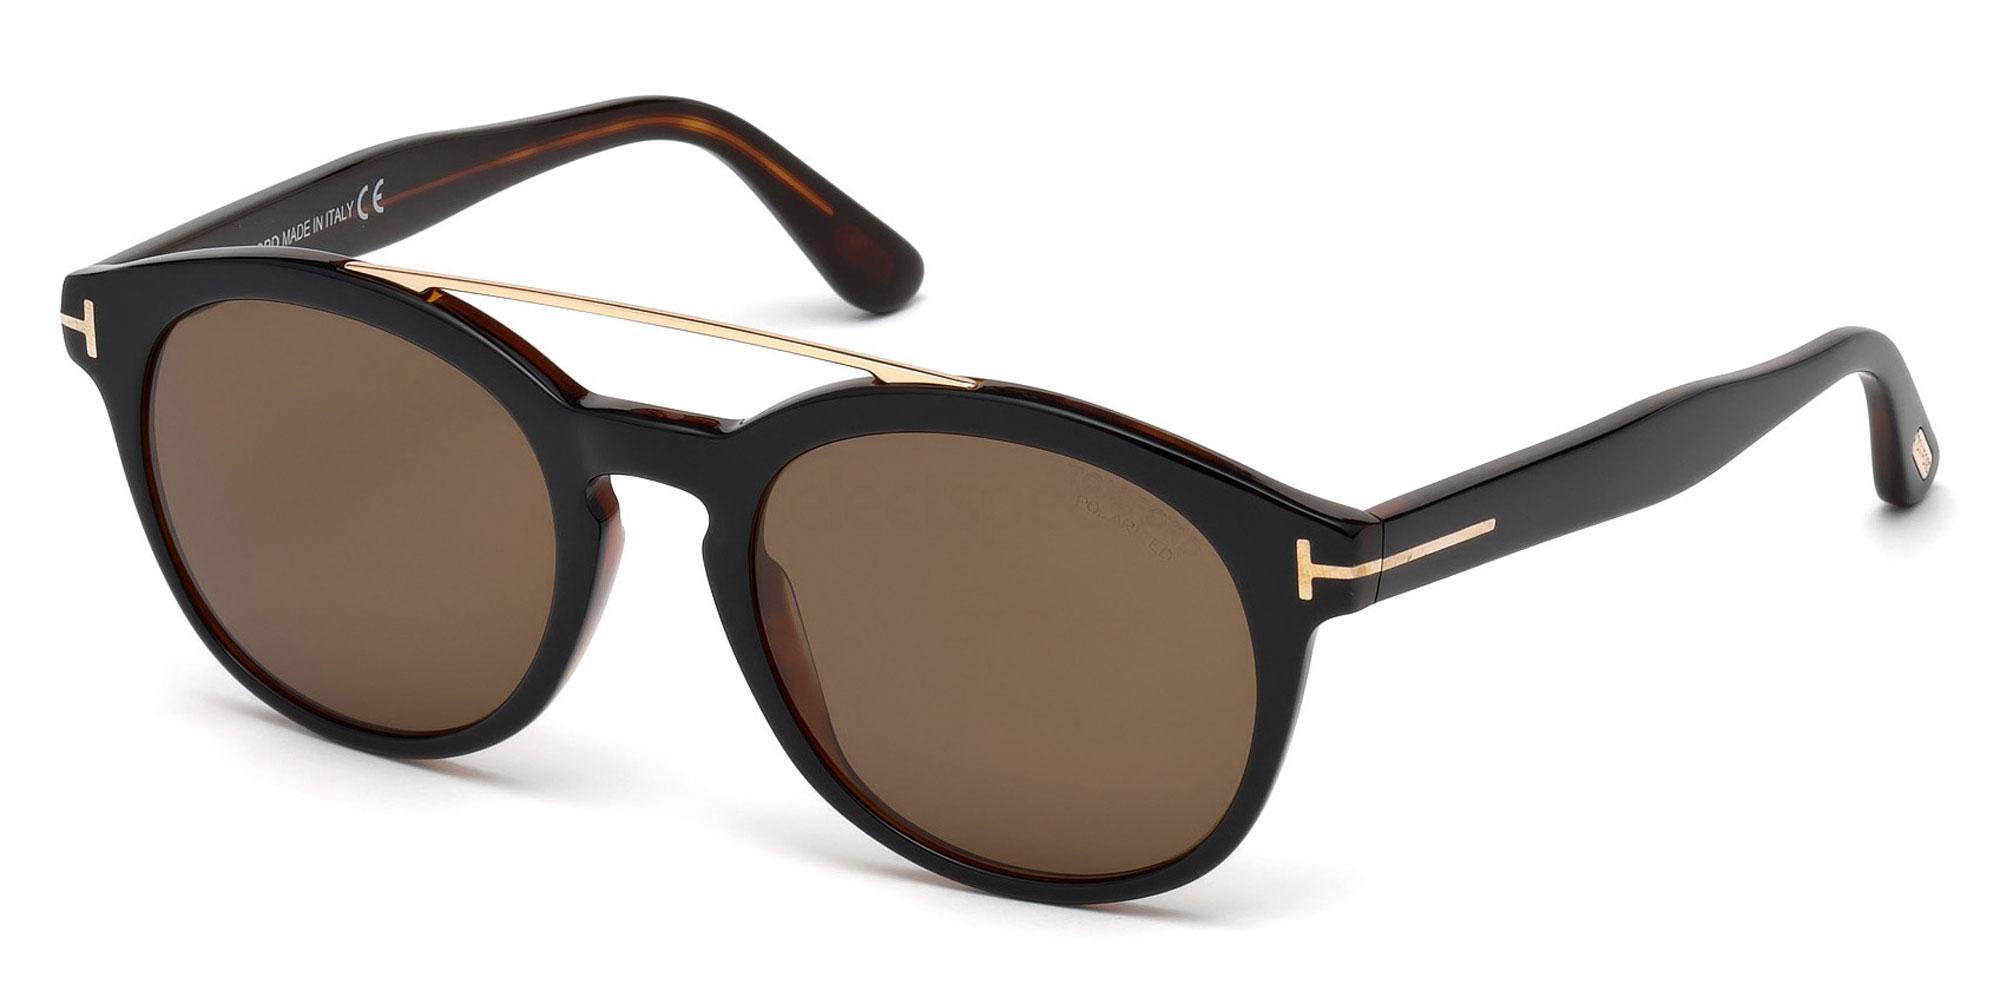 05H FT0515 Sunglasses, Tom Ford